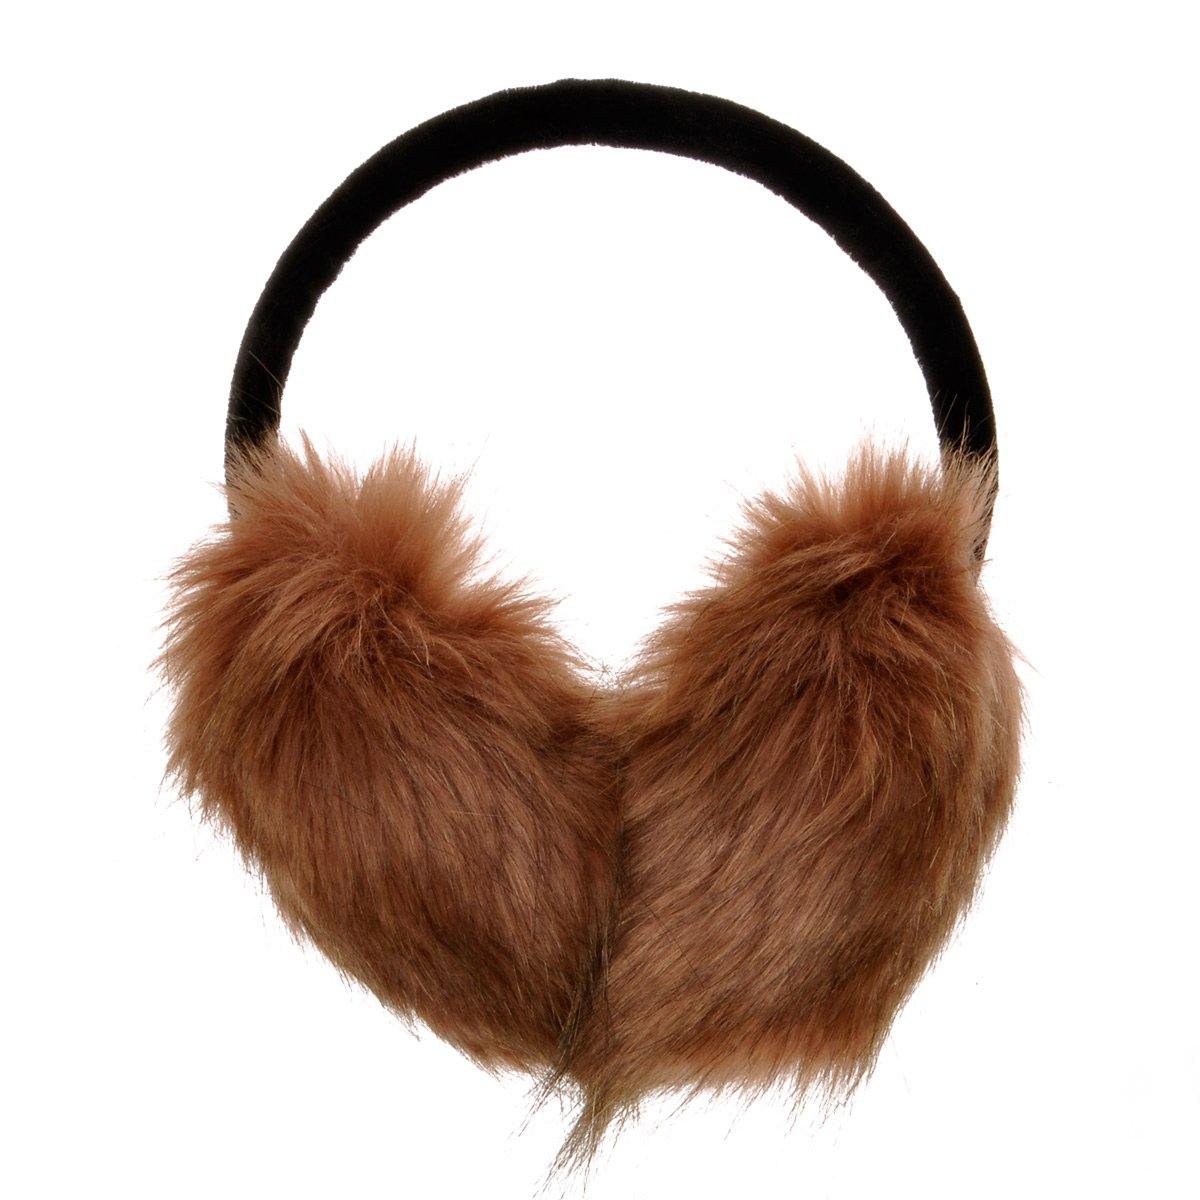 ZLYC Womens Girls Winter Fashion Adjustable Faux Fur EarMuffs Ear Warmers (Brown) ZYJ-ET-007-BR_CA